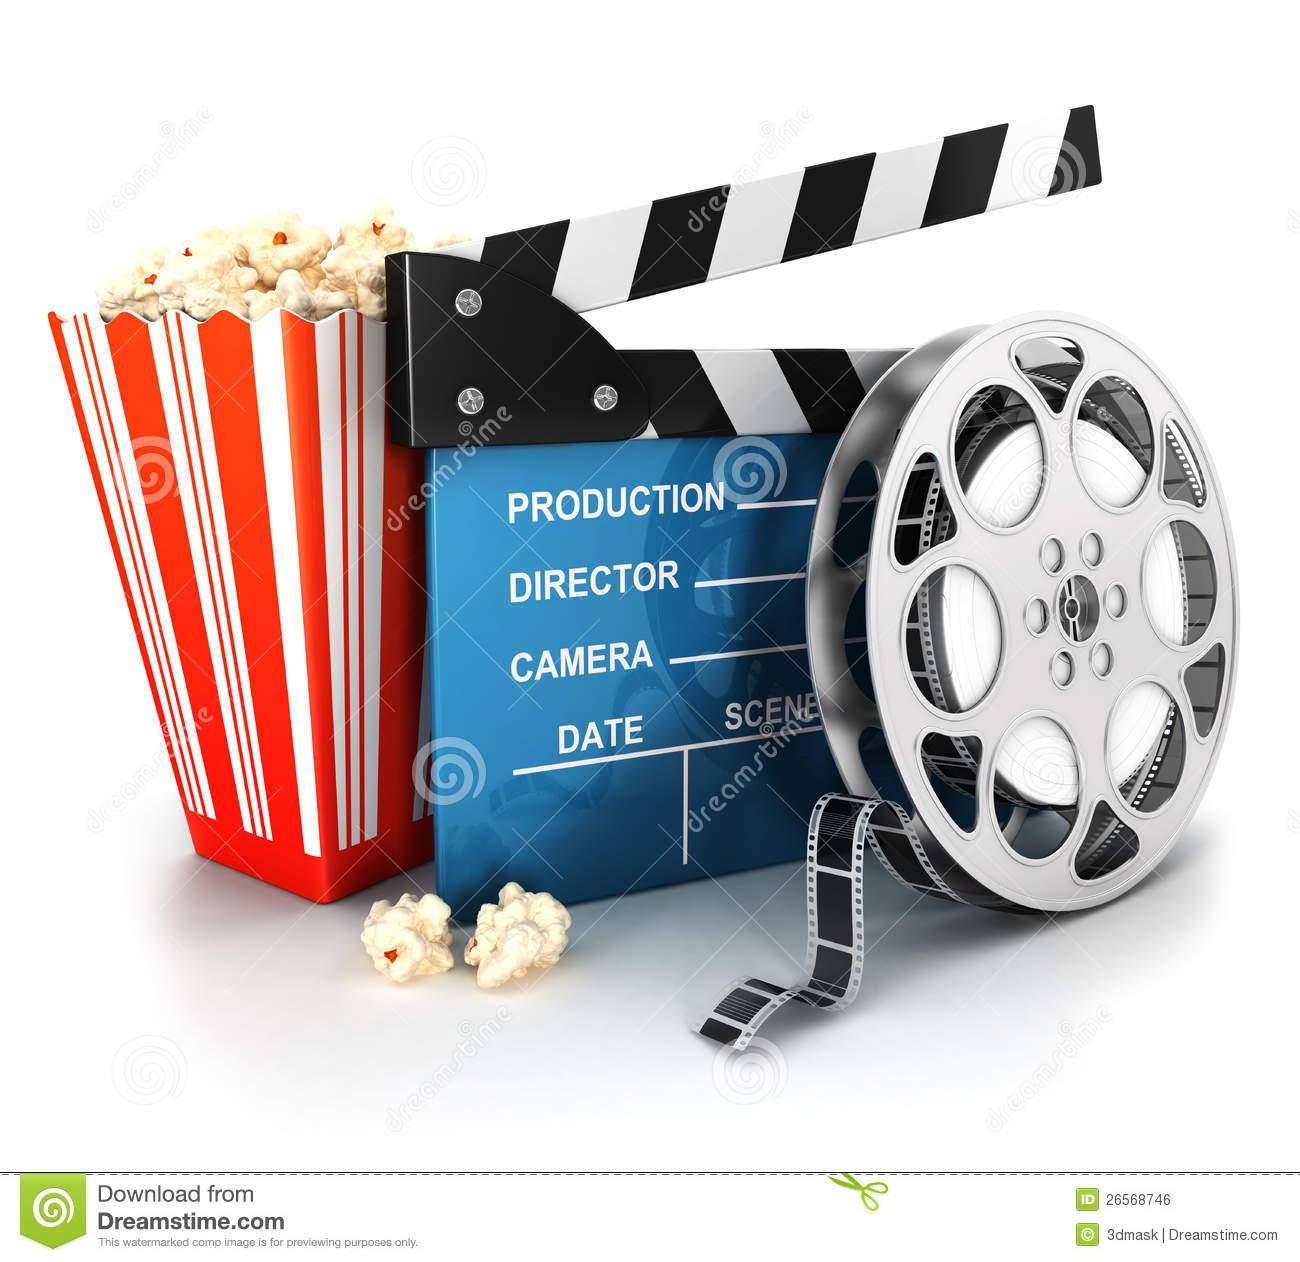 Kinos clipart #13